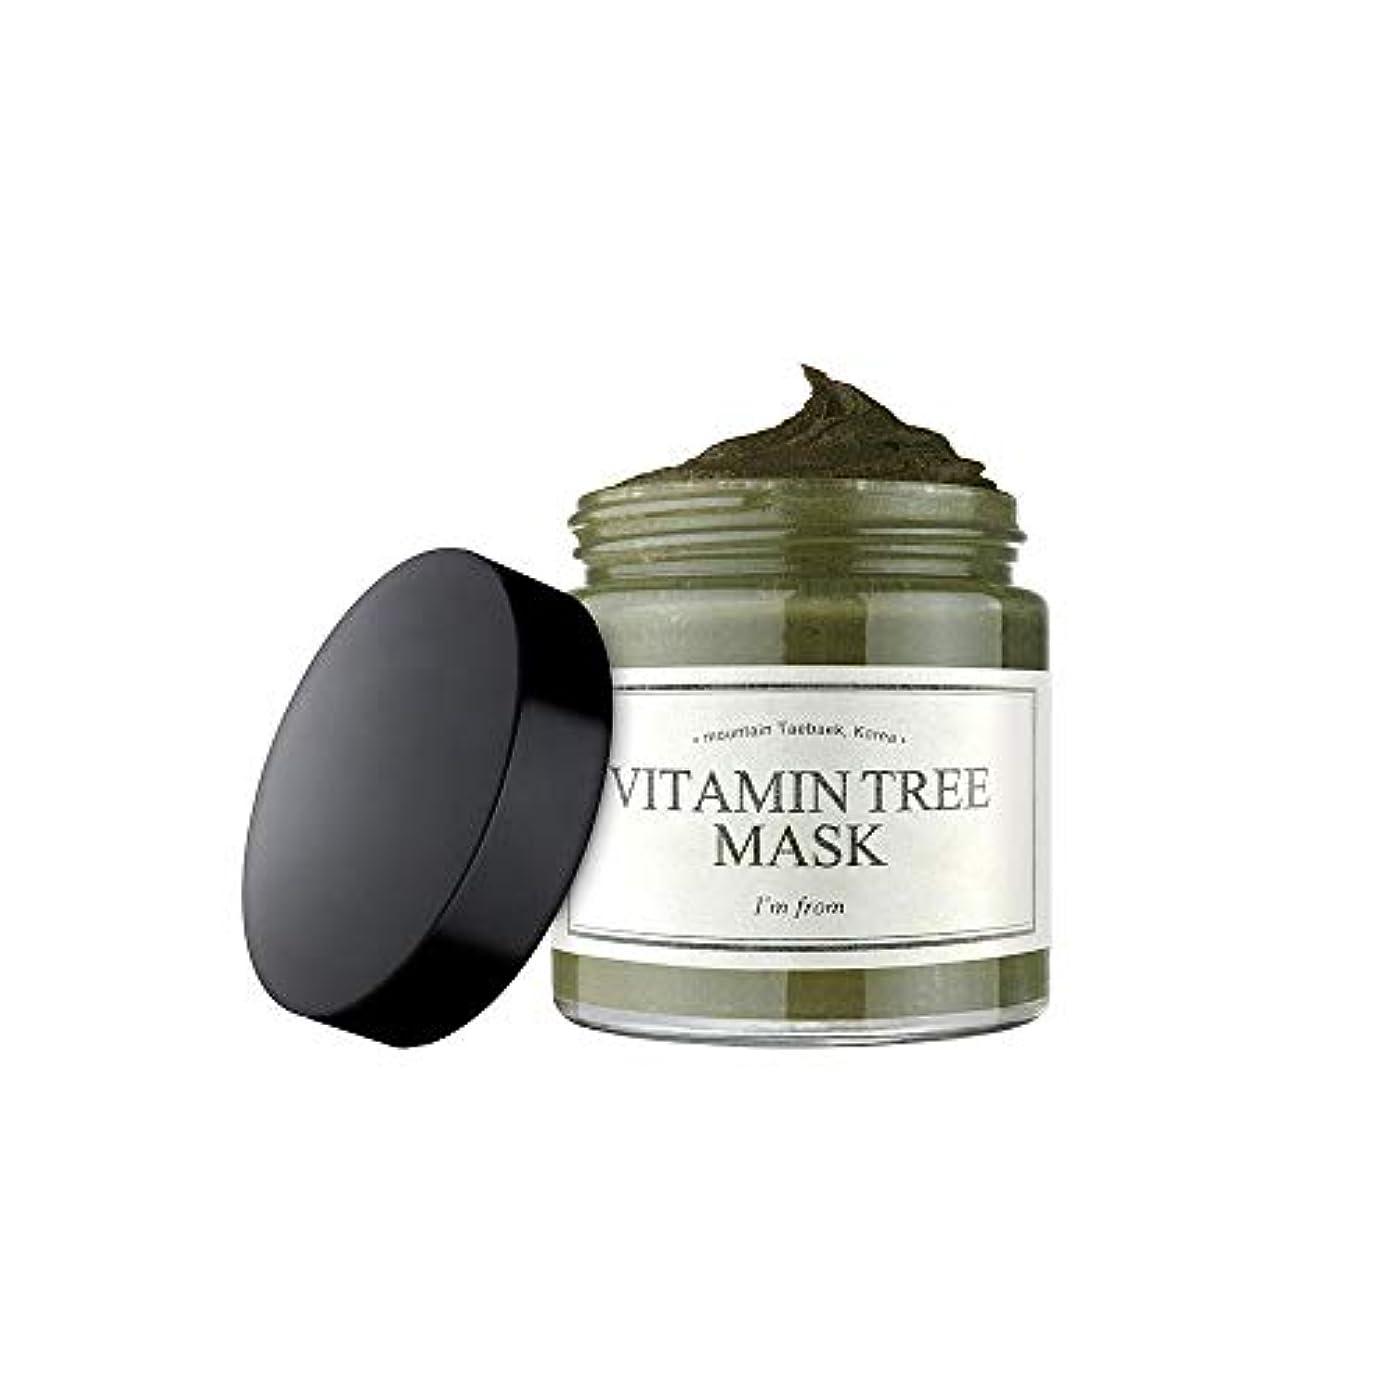 [I'M FROM] Vitamin Tree Mask [並行輸入品]